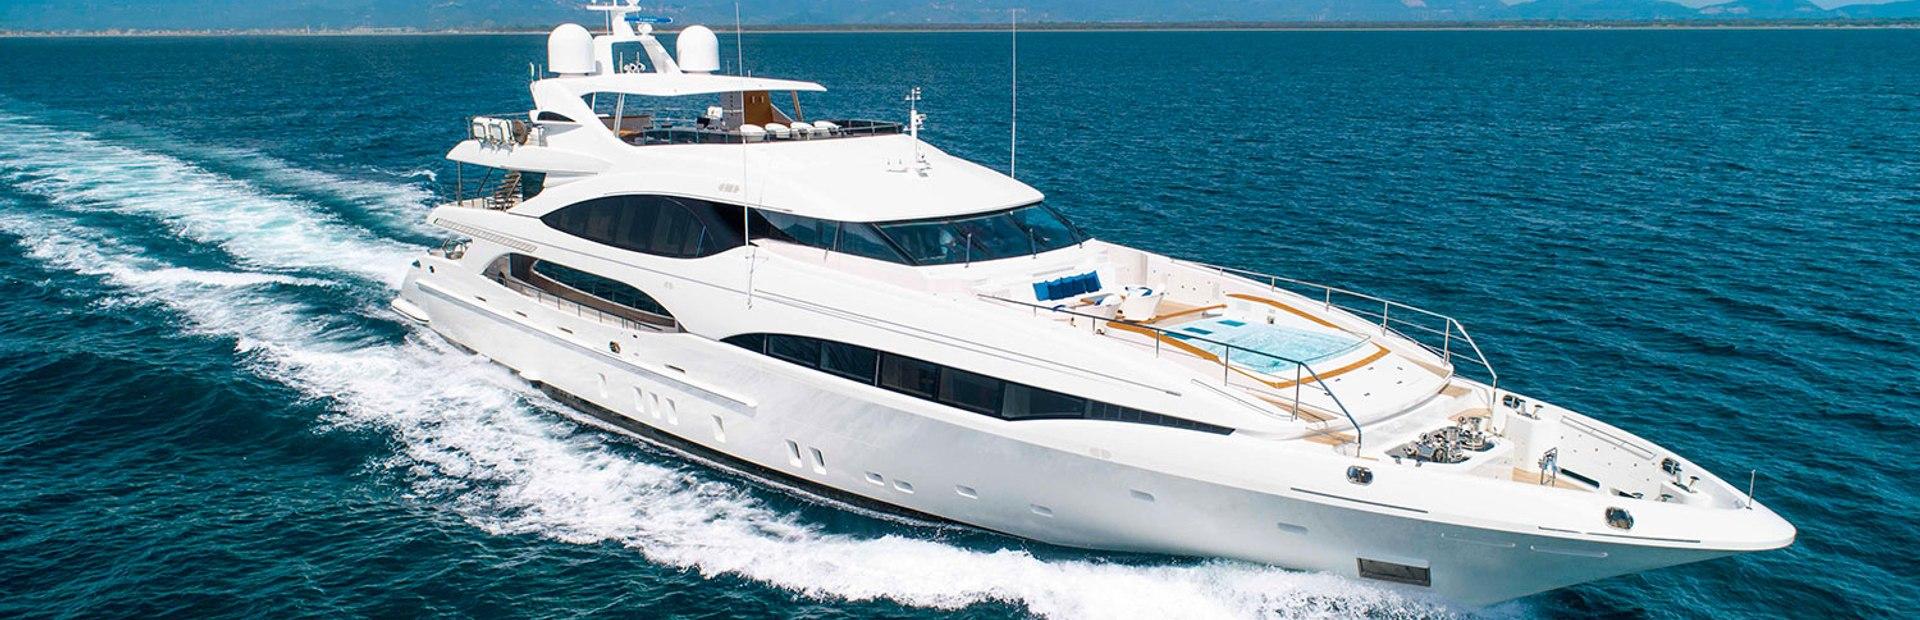 Mangusta Oceano 46 Yacht Charter